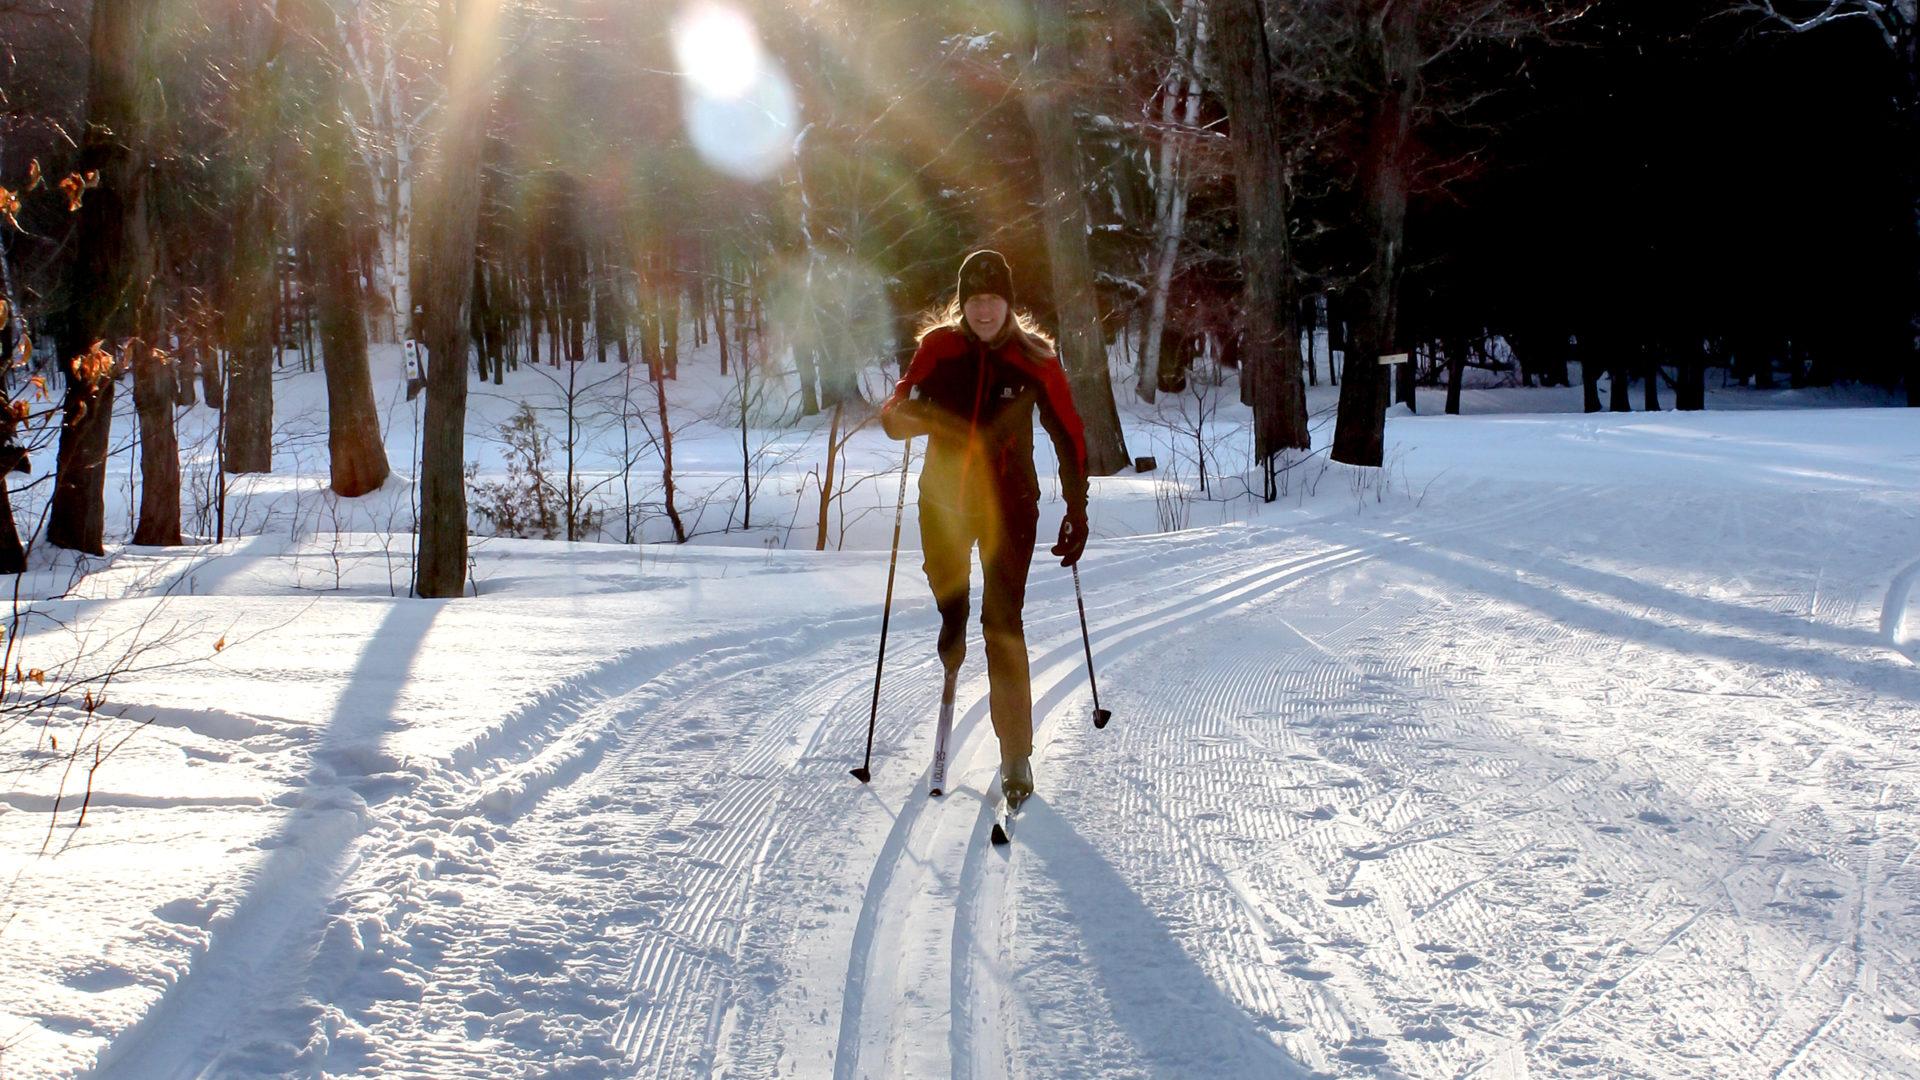 moonlight cross country skiing